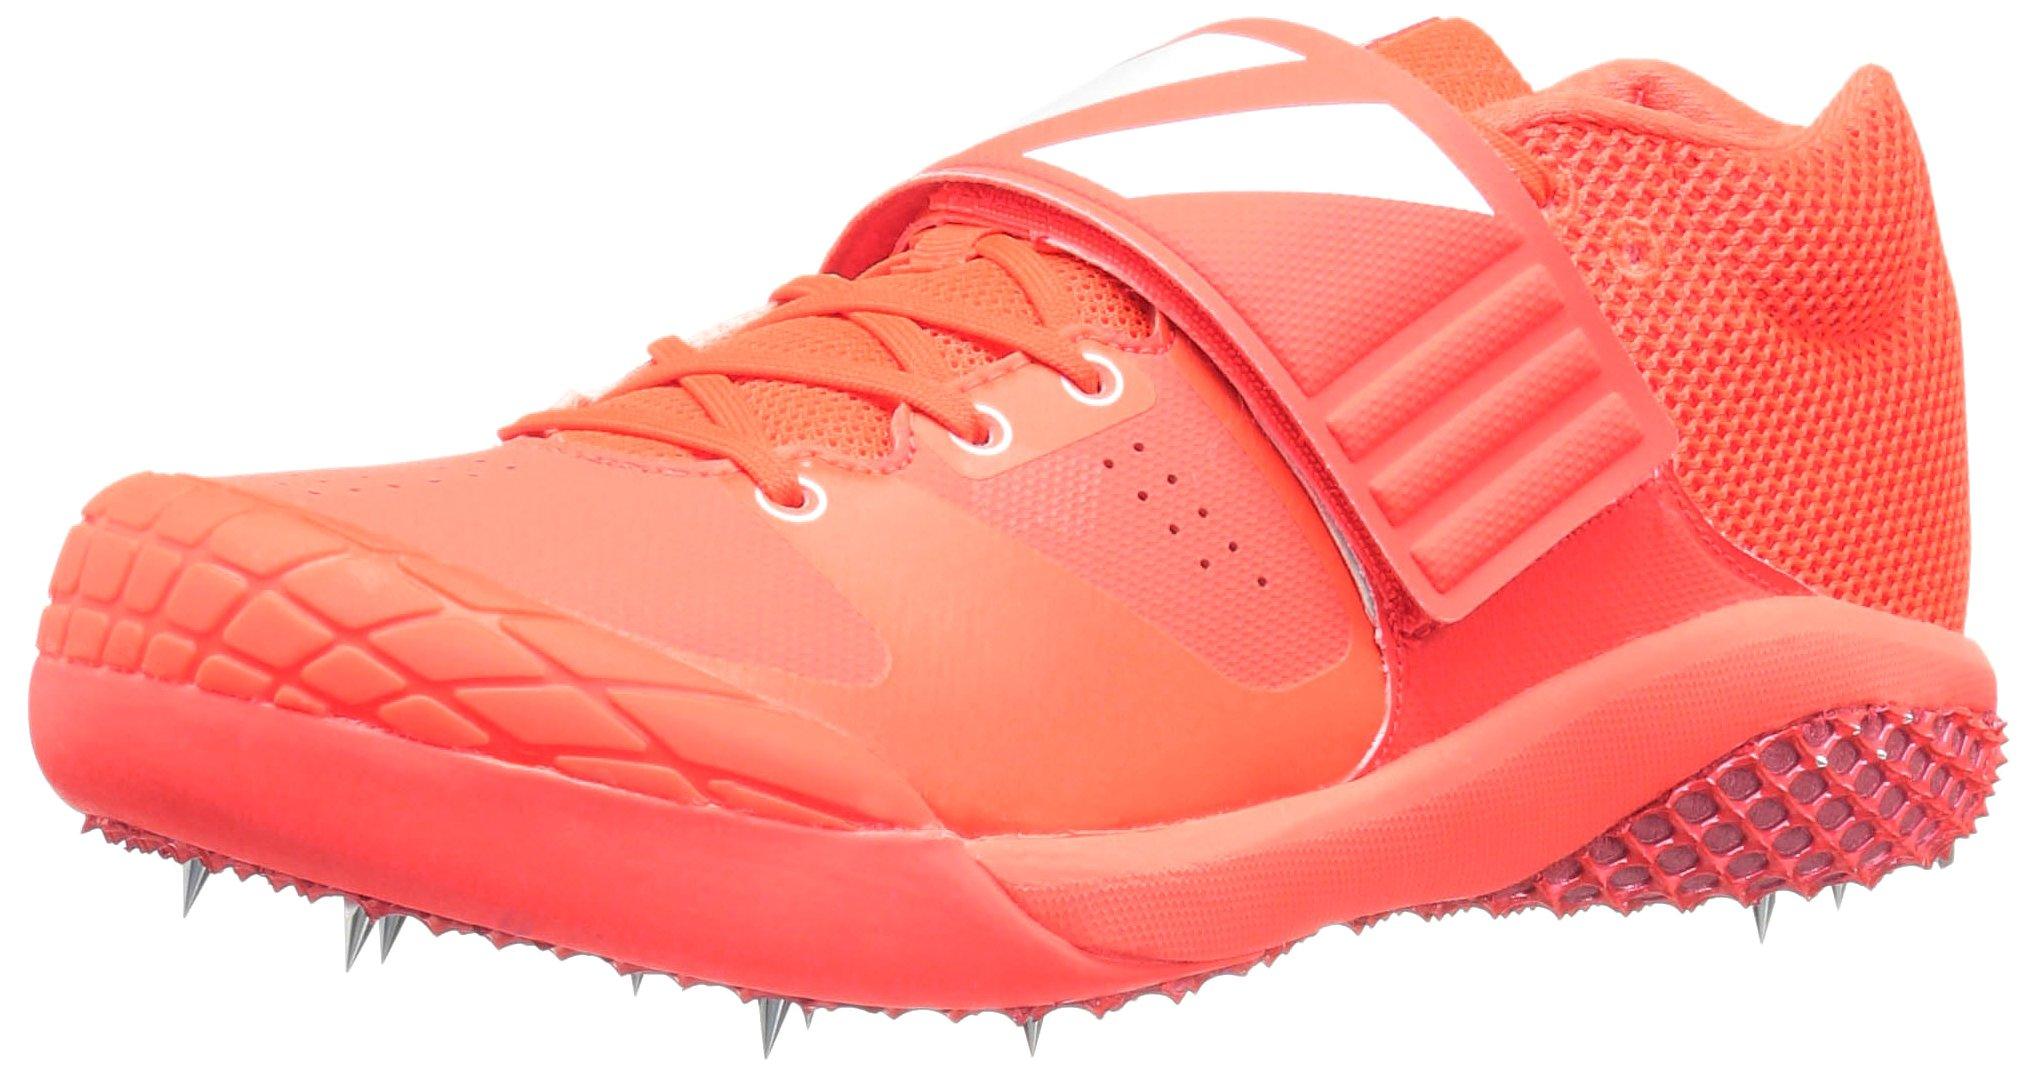 adidas Adizero Javelin Track Shoe, Solar Red/White/Metallic/Silver, 12.5 M US